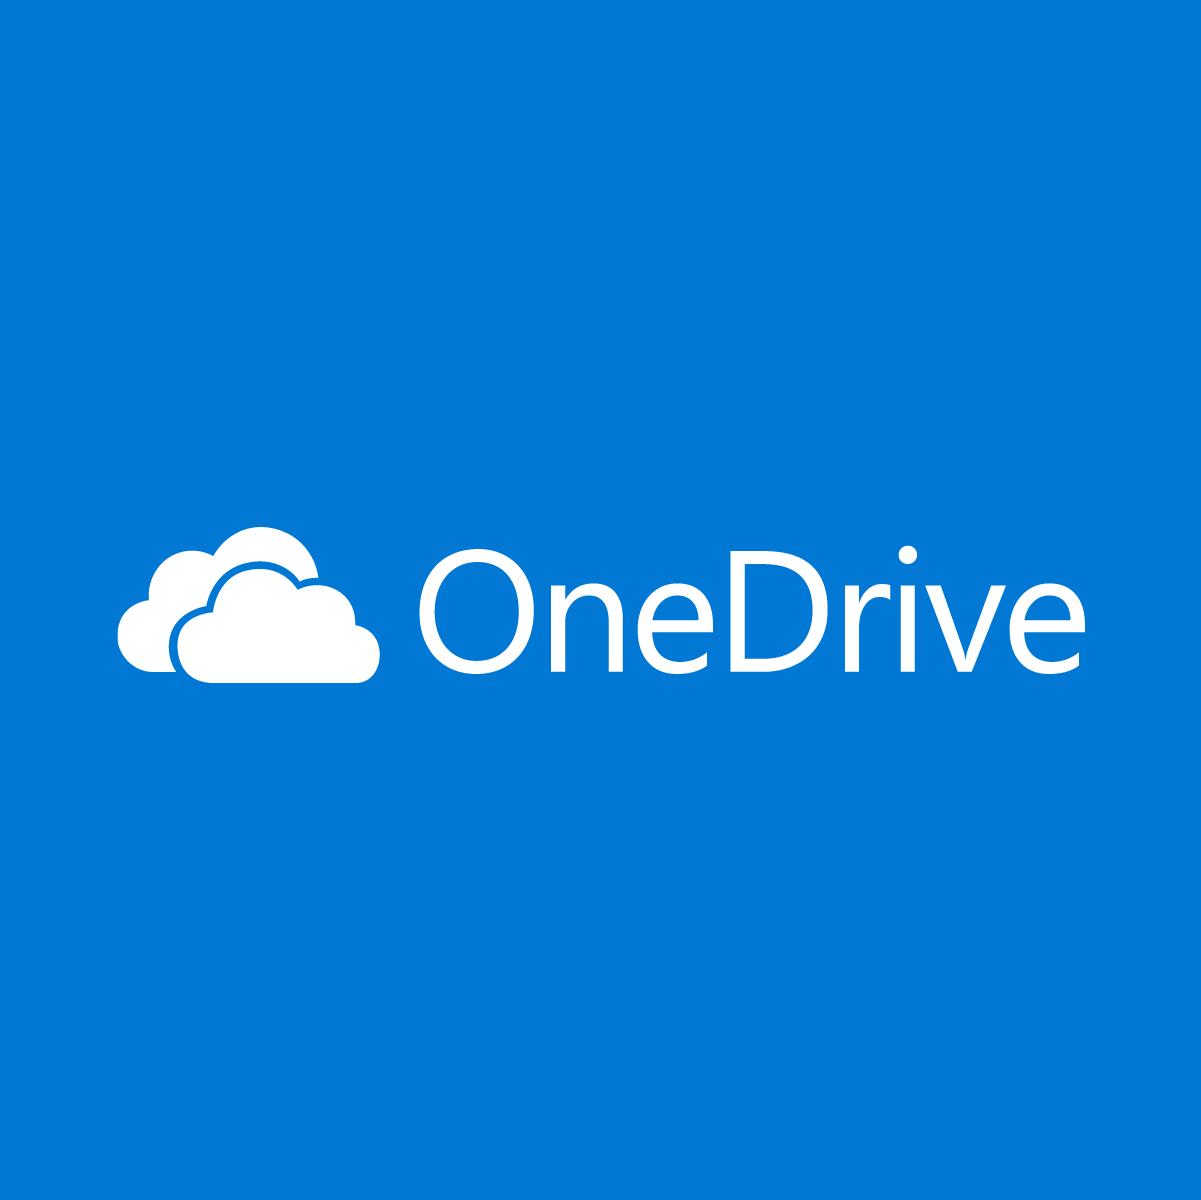 Microsoft OneDrive Plans